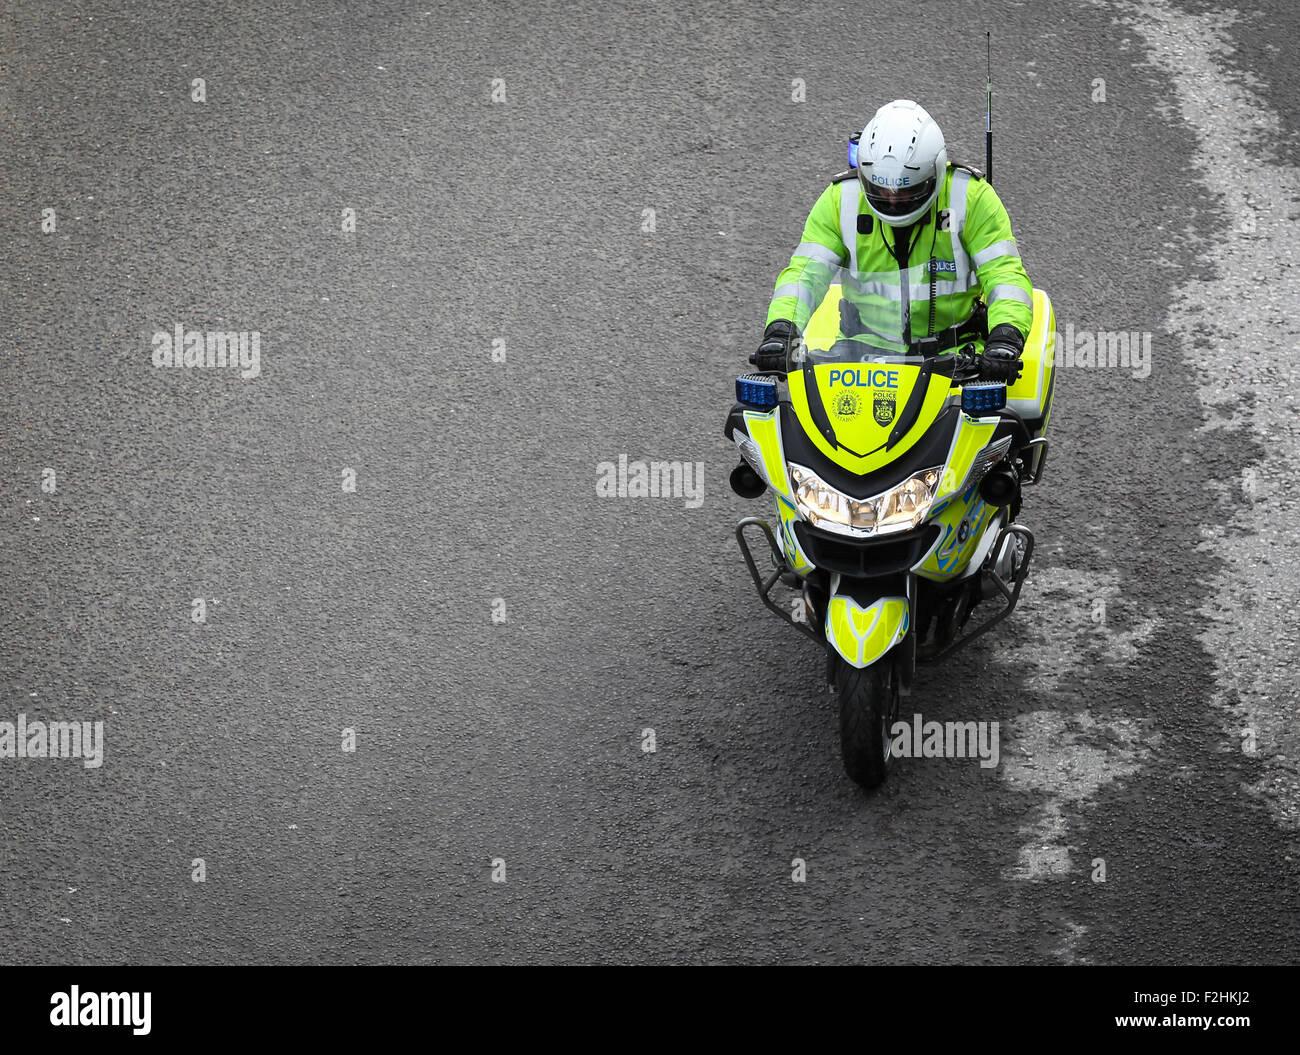 Police motorbike traffic officer UK - Stock Image